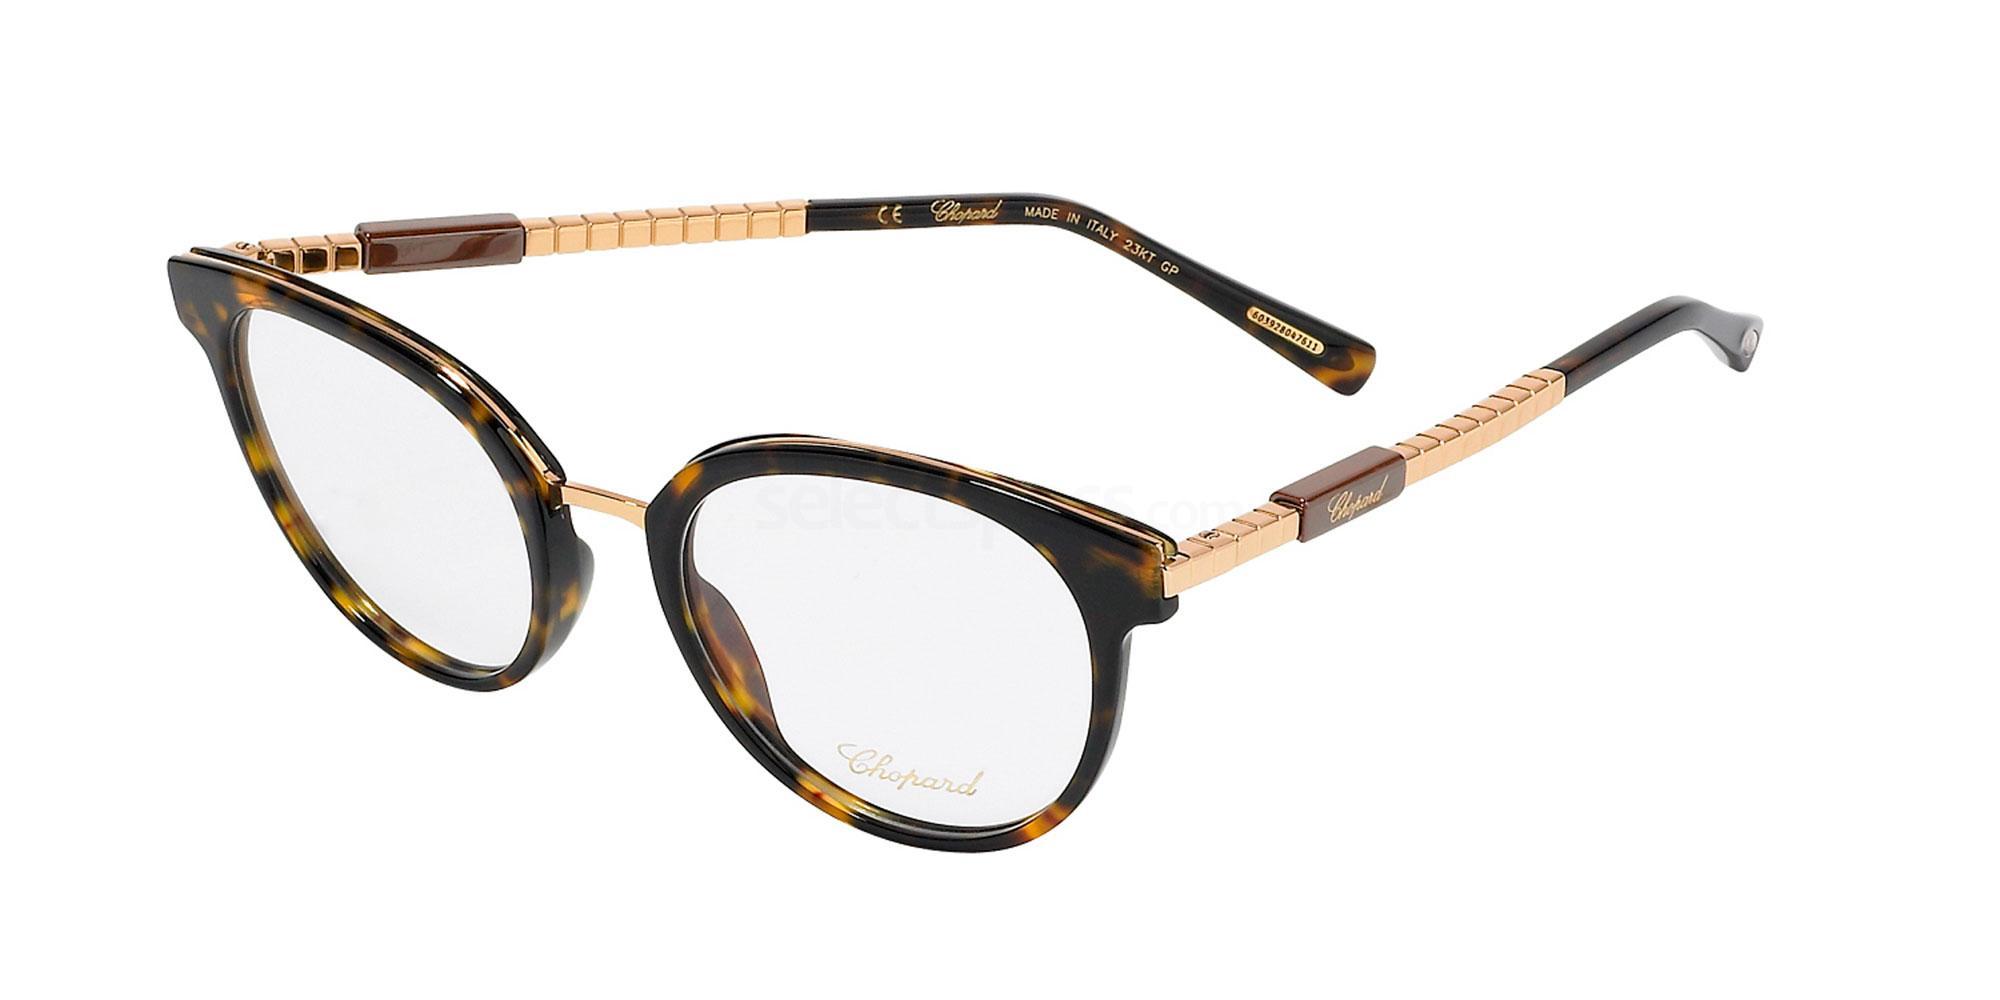 0722 VCH239 Glasses, Chopard